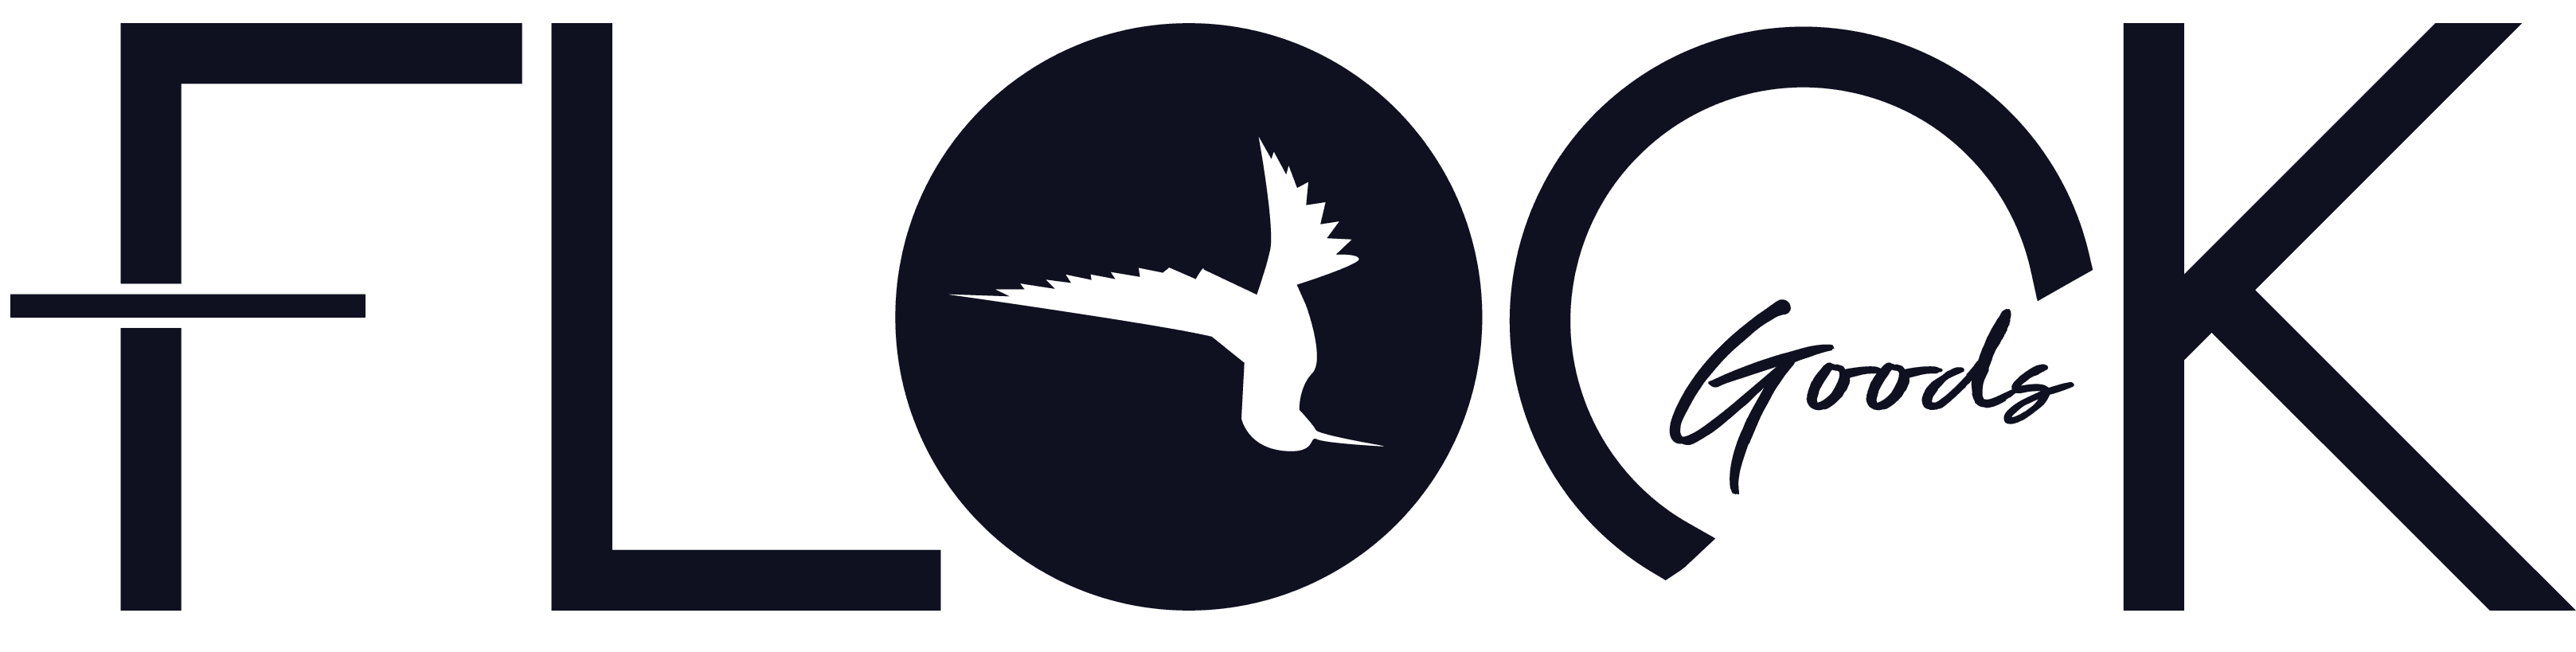 flock-goods-cbd-logo